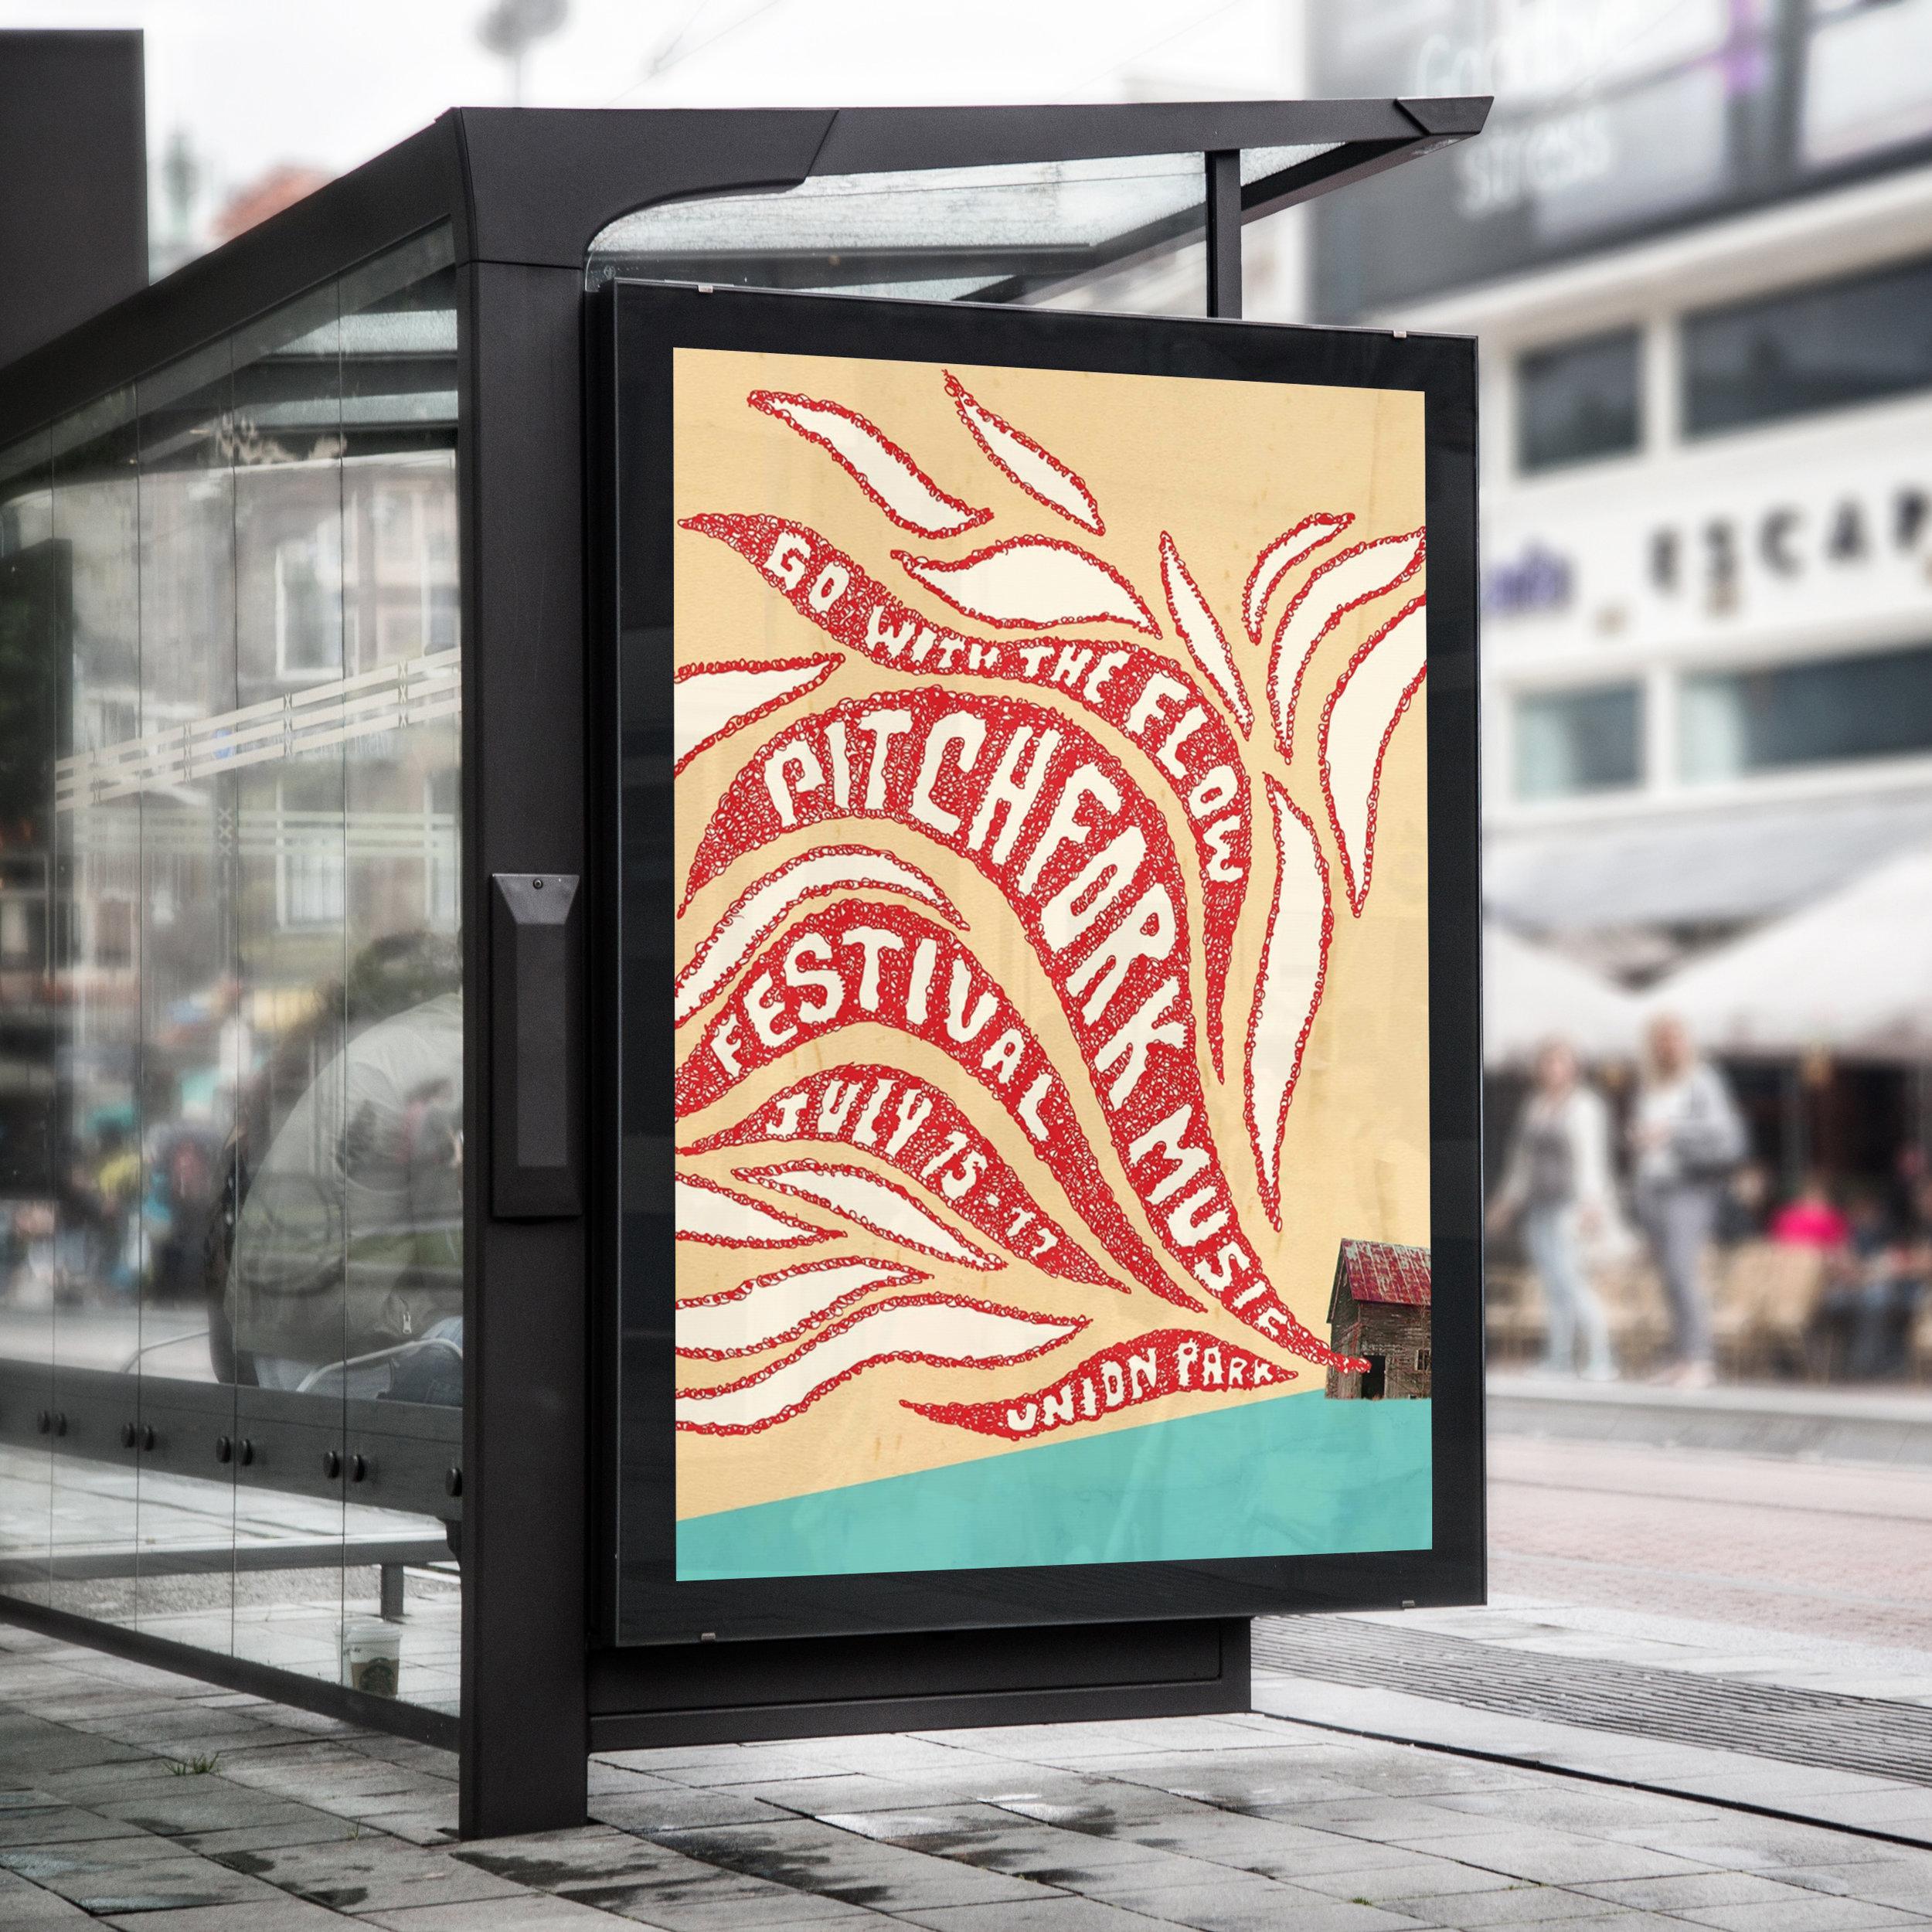 Pitchfork Music Festival Website & Poster concept